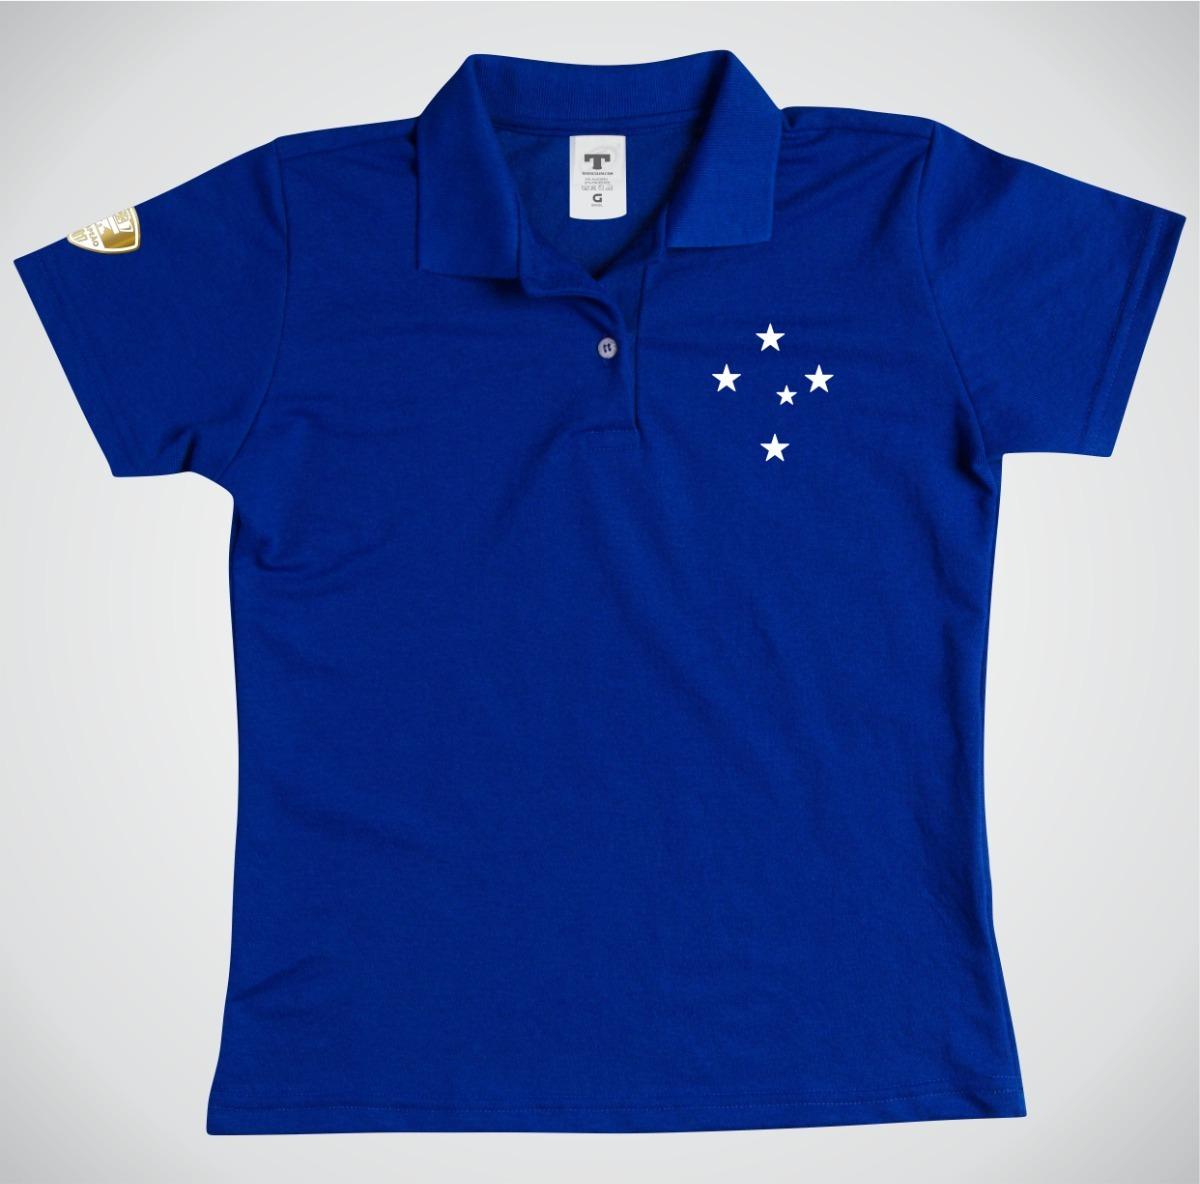 65afd09b53 camiseta gola polo feminina cruzeiro baby look. Carregando zoom.